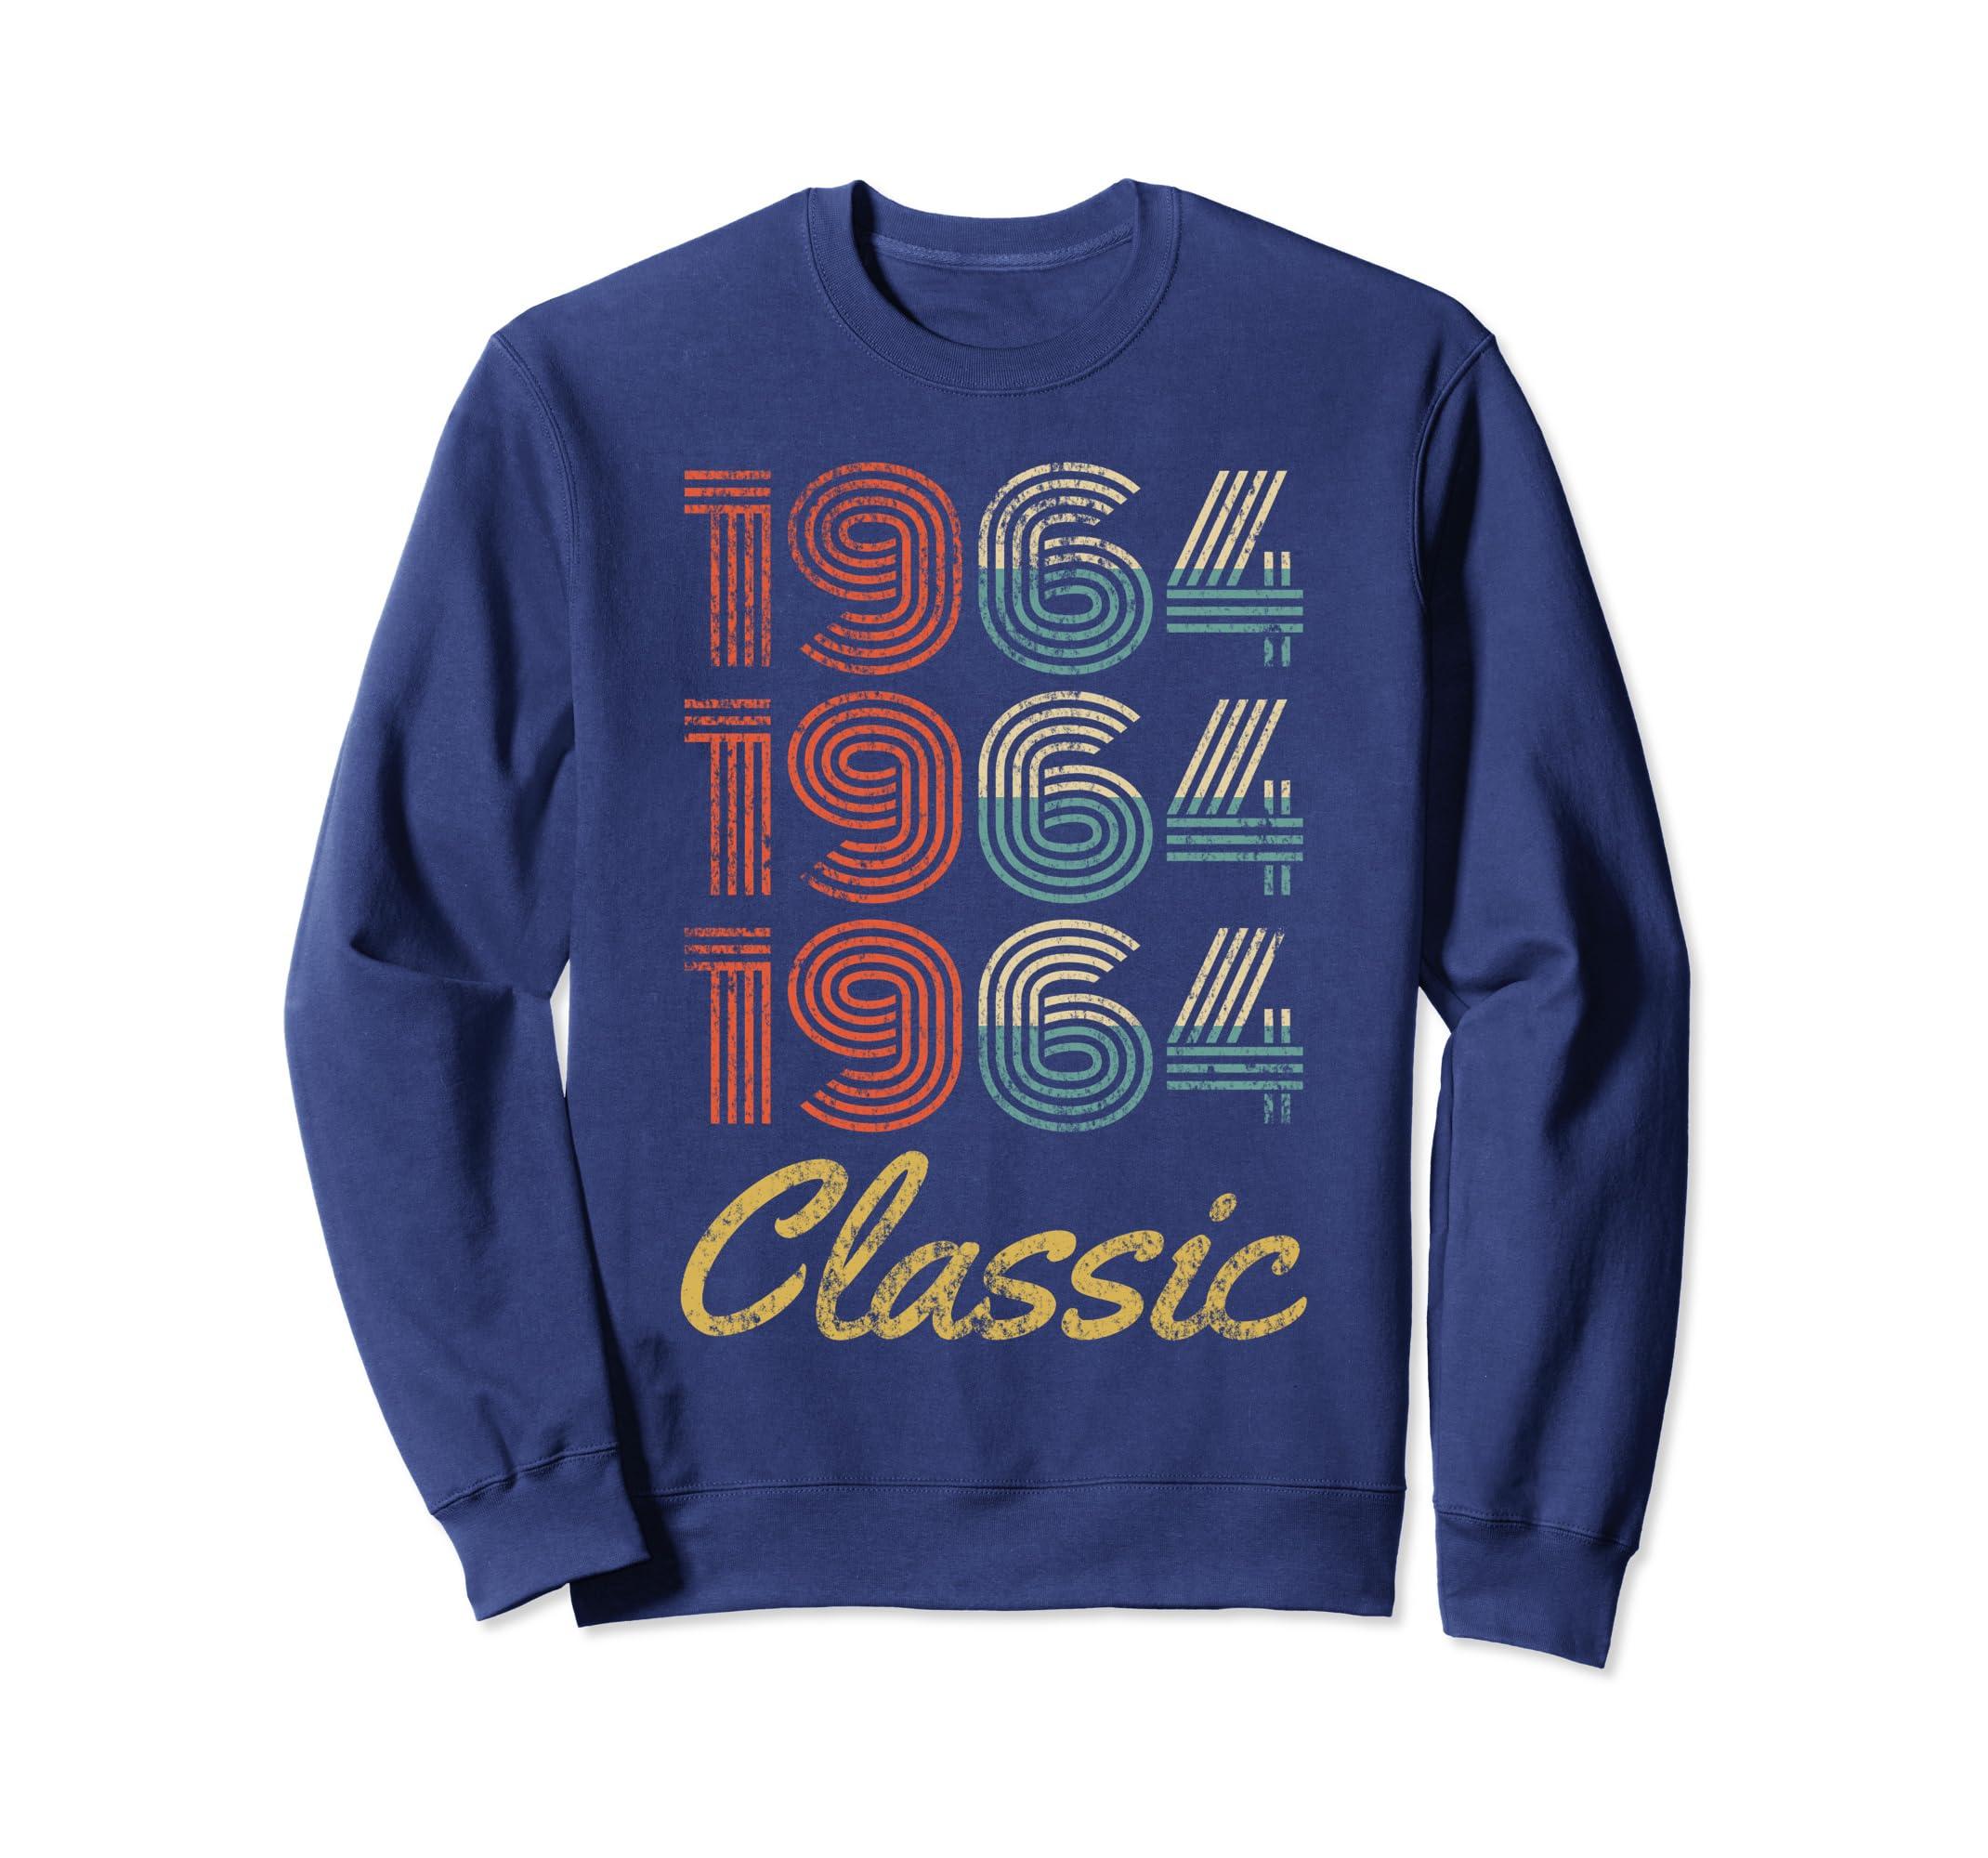 Vintage 1964 Classic   Born in 1964 Birthday Gift Sweatshirt-Bawle